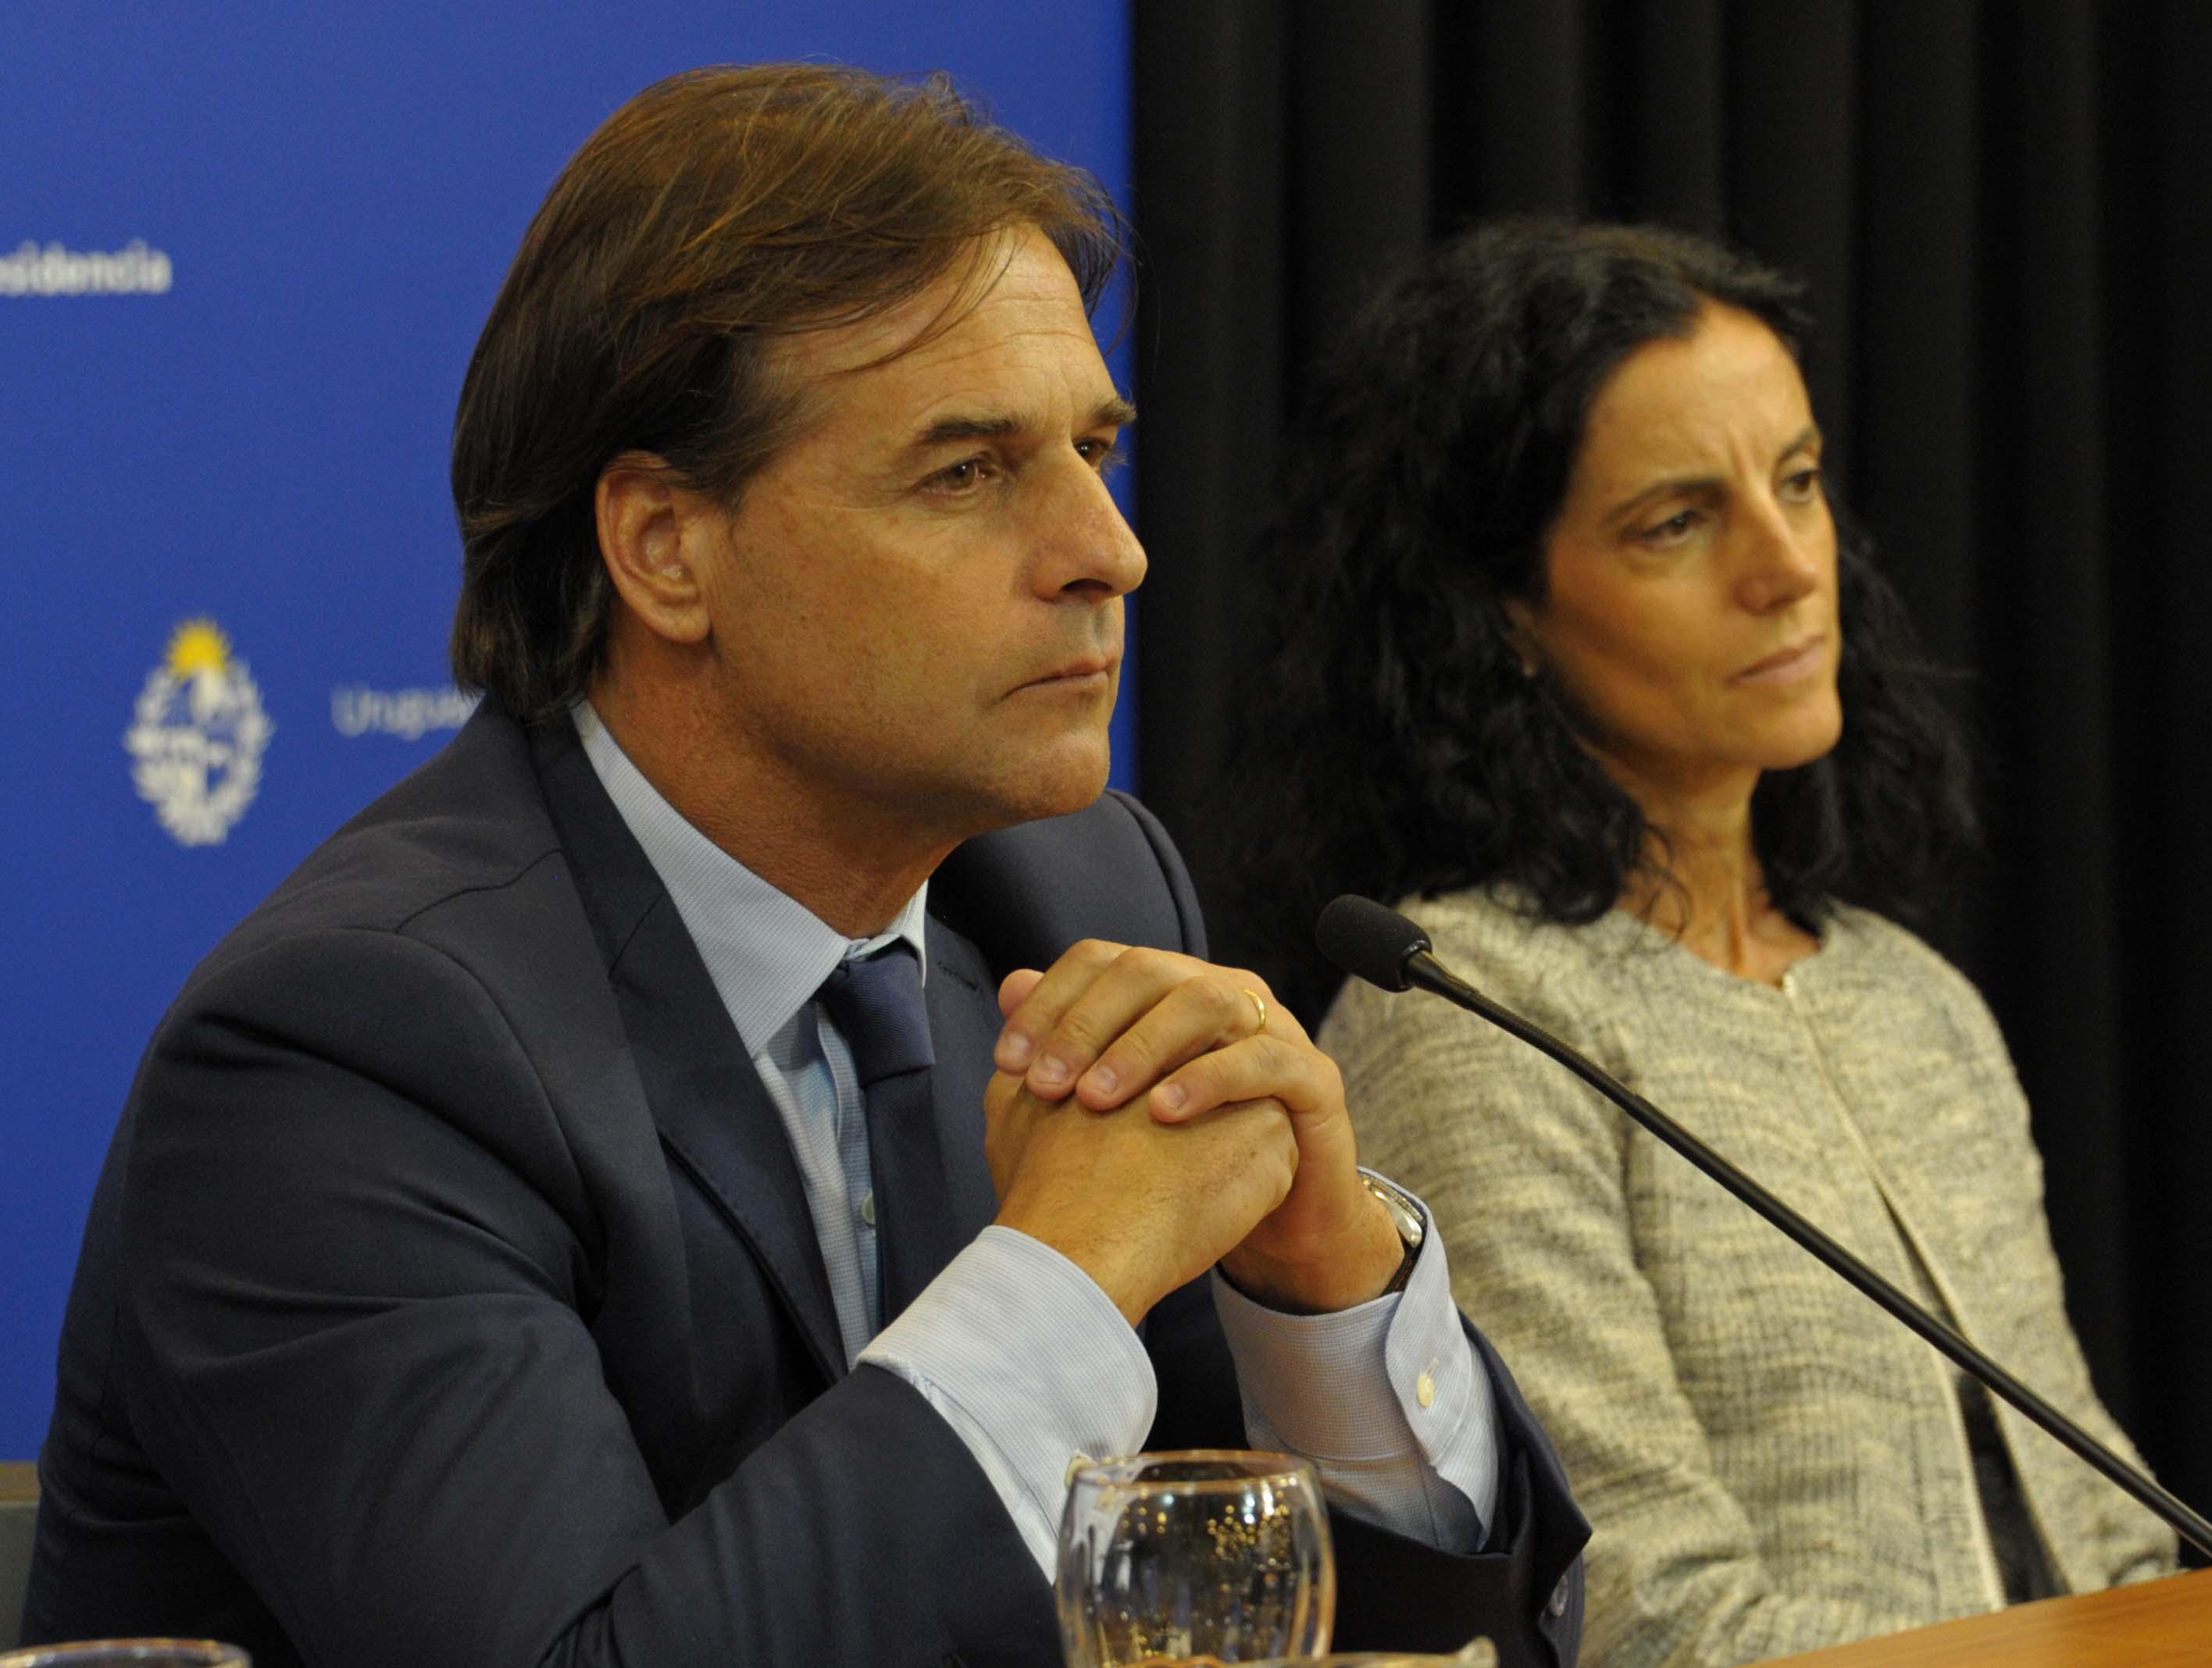 Presidente Luis Lacalle Pou encabezó conferencia de prensa junto a ministros Daniel Salinas, Pablo Bartol, Azucena Arbeleche y Pablo Mieres